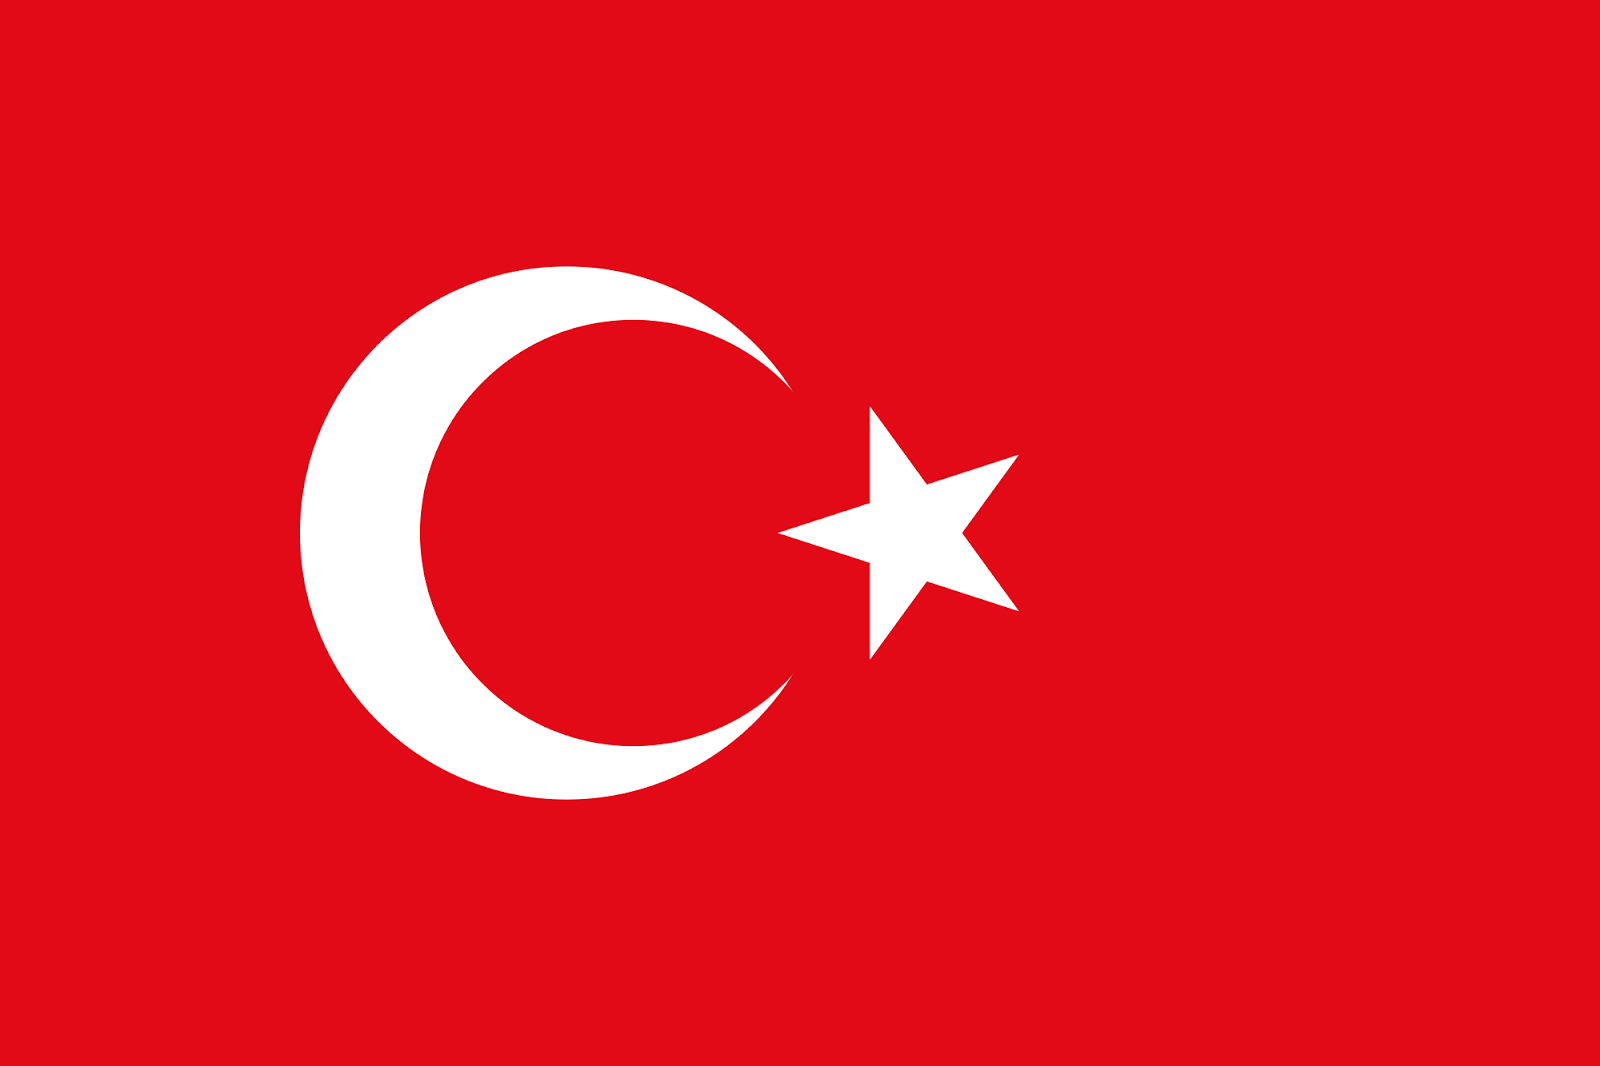 http://carbrandsincurrentproduction.blogspot.com.es/search/label/Turkey